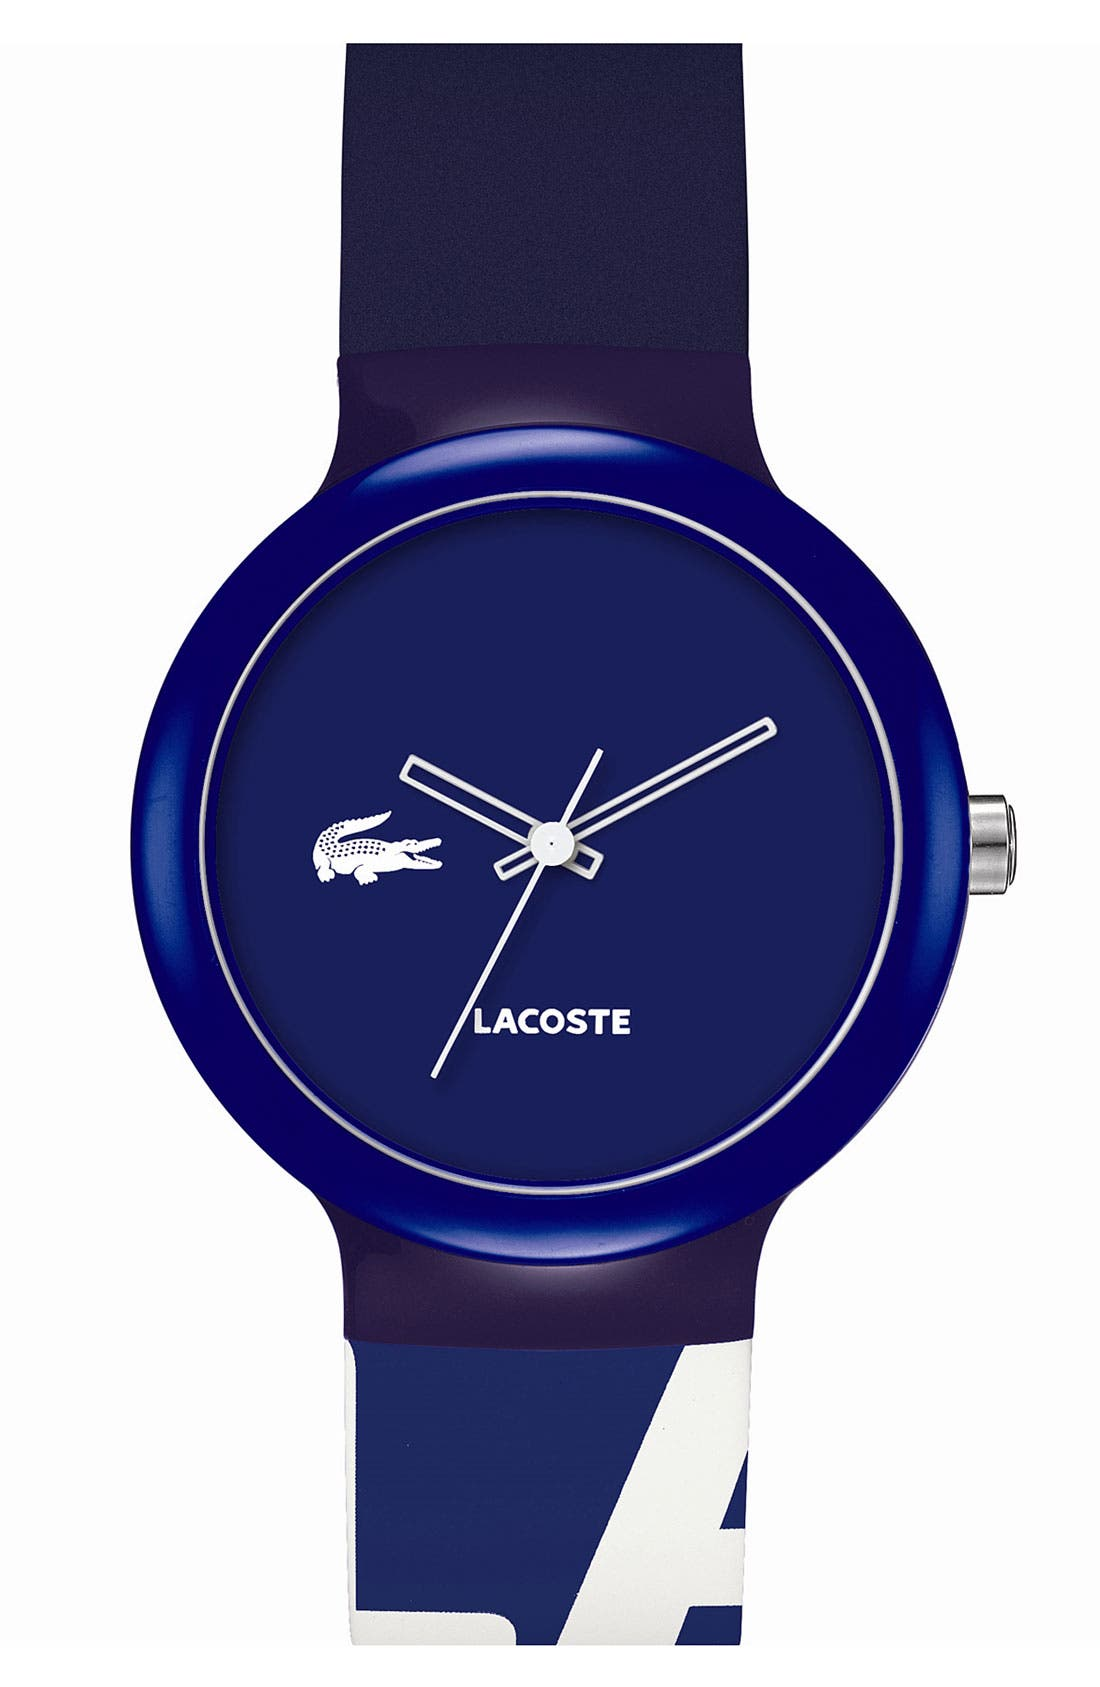 Main Image - Lacoste 'Goa' Colorblock Silicone Strap Watch, 40mm